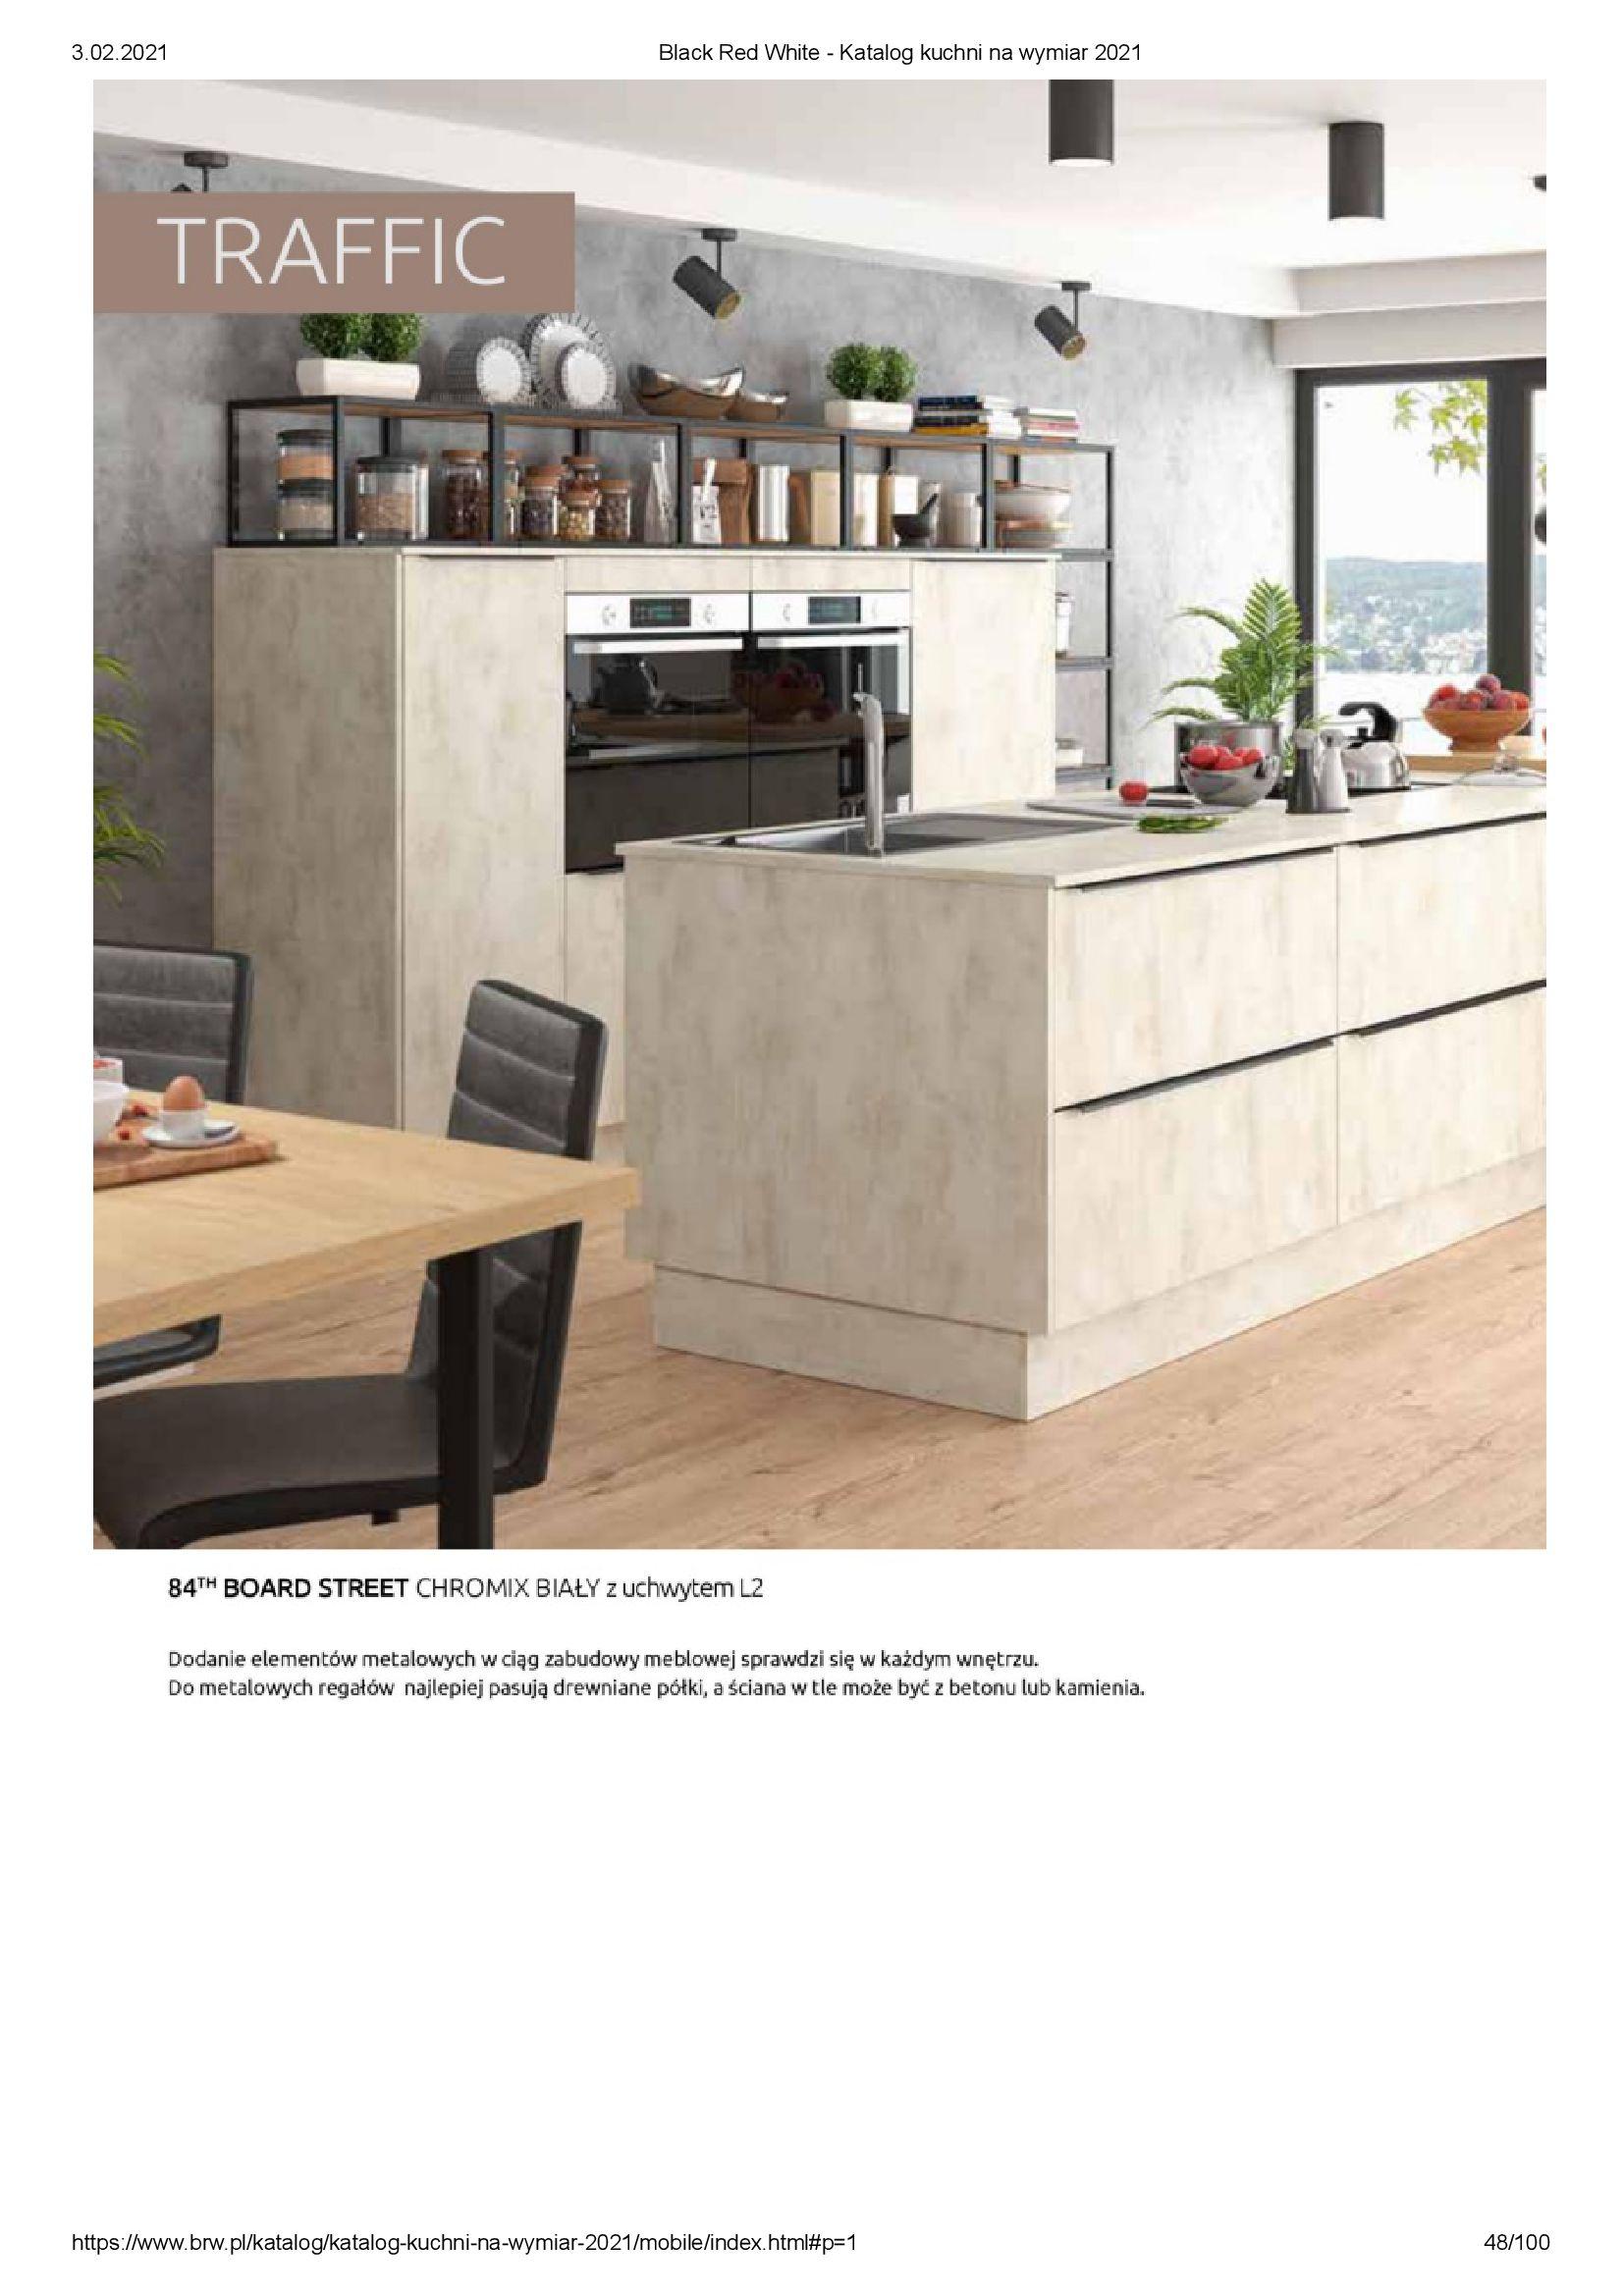 Gazetka Black Red White: Katalog - Kuchnie na wymiar Senso Kitchens 2021 2021-01-01 page-48